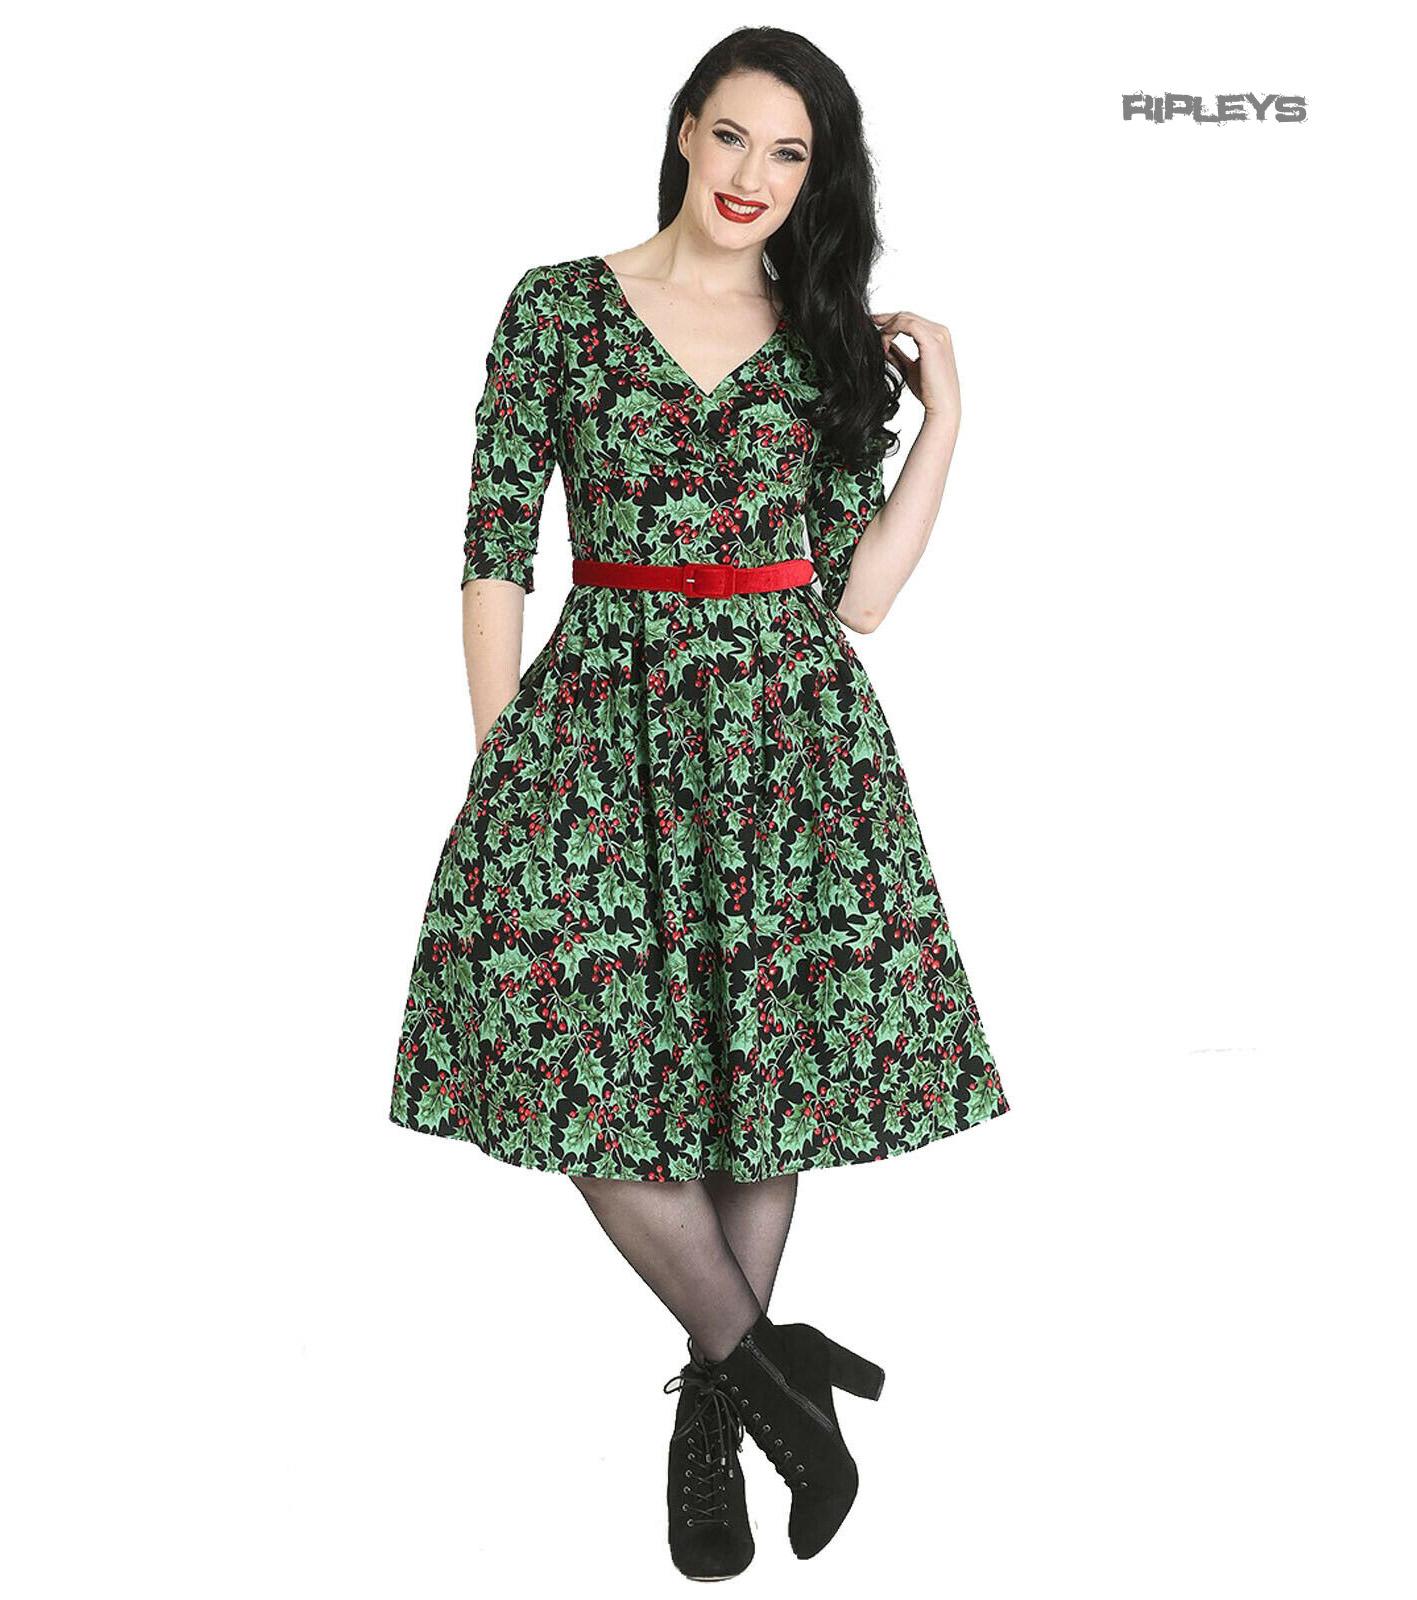 Hell-Bunny-50s-Pin-Up-Navidad-Vestido-Festivo-Rojo-Holly-Berry-Negro-Todos-los-Tamanos miniatura 26